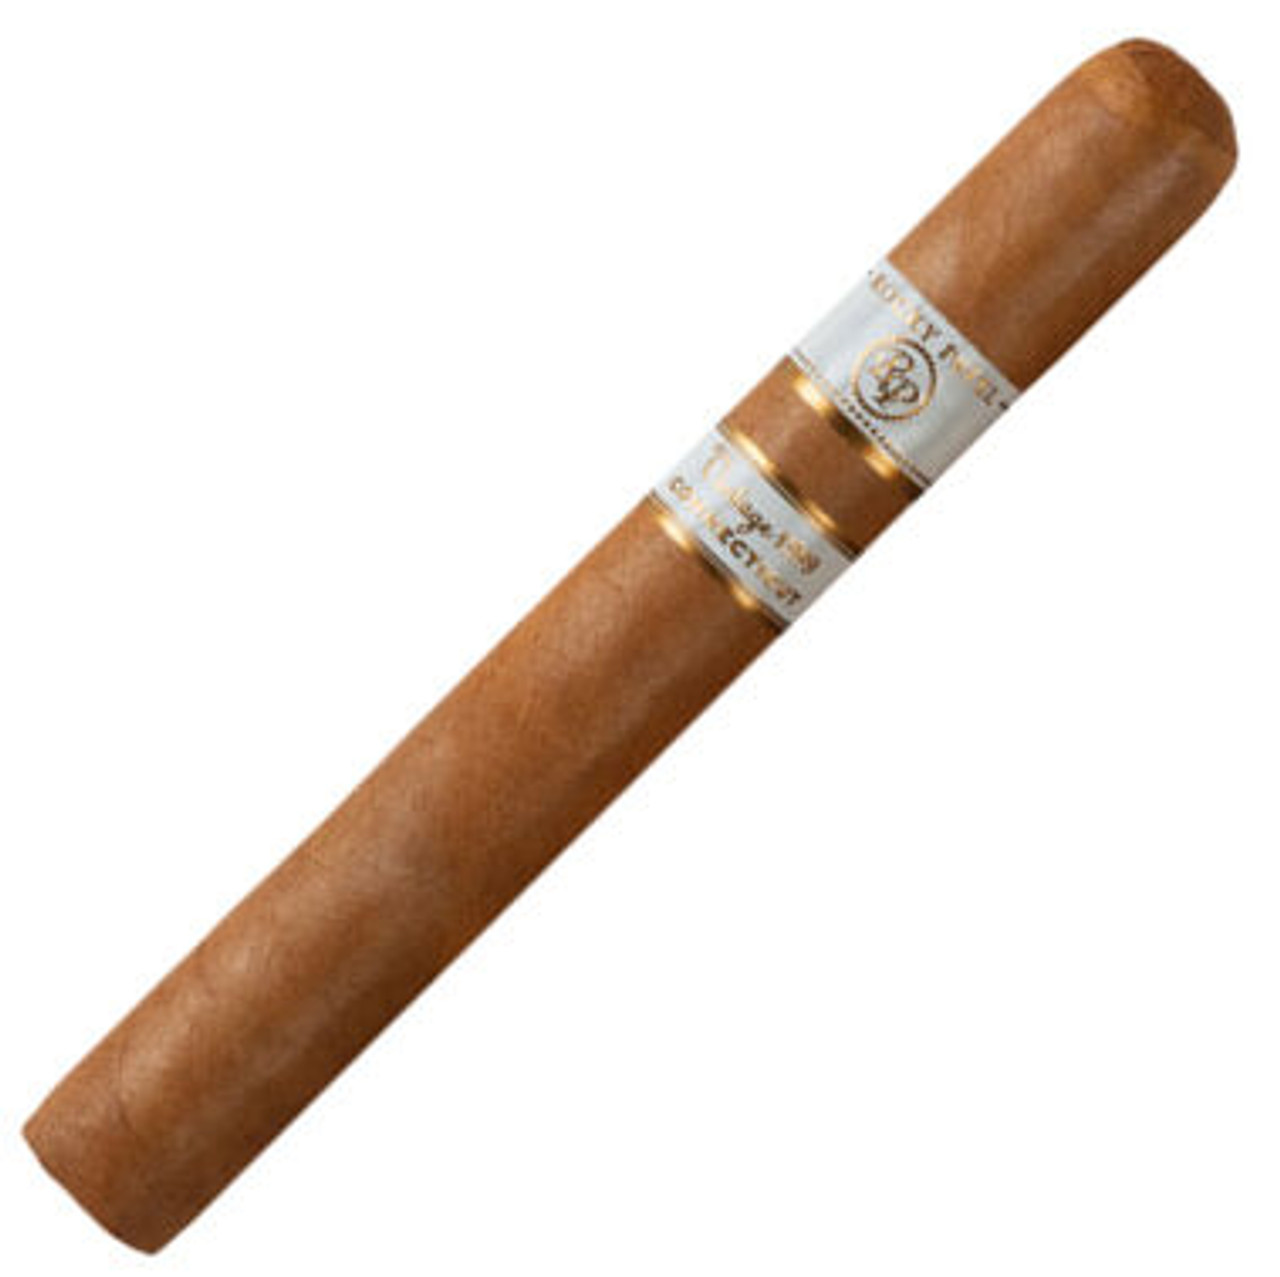 Rocky Patel Vintage 1999 Toro Cigars - 6.5 x 52 (Pack of 5)